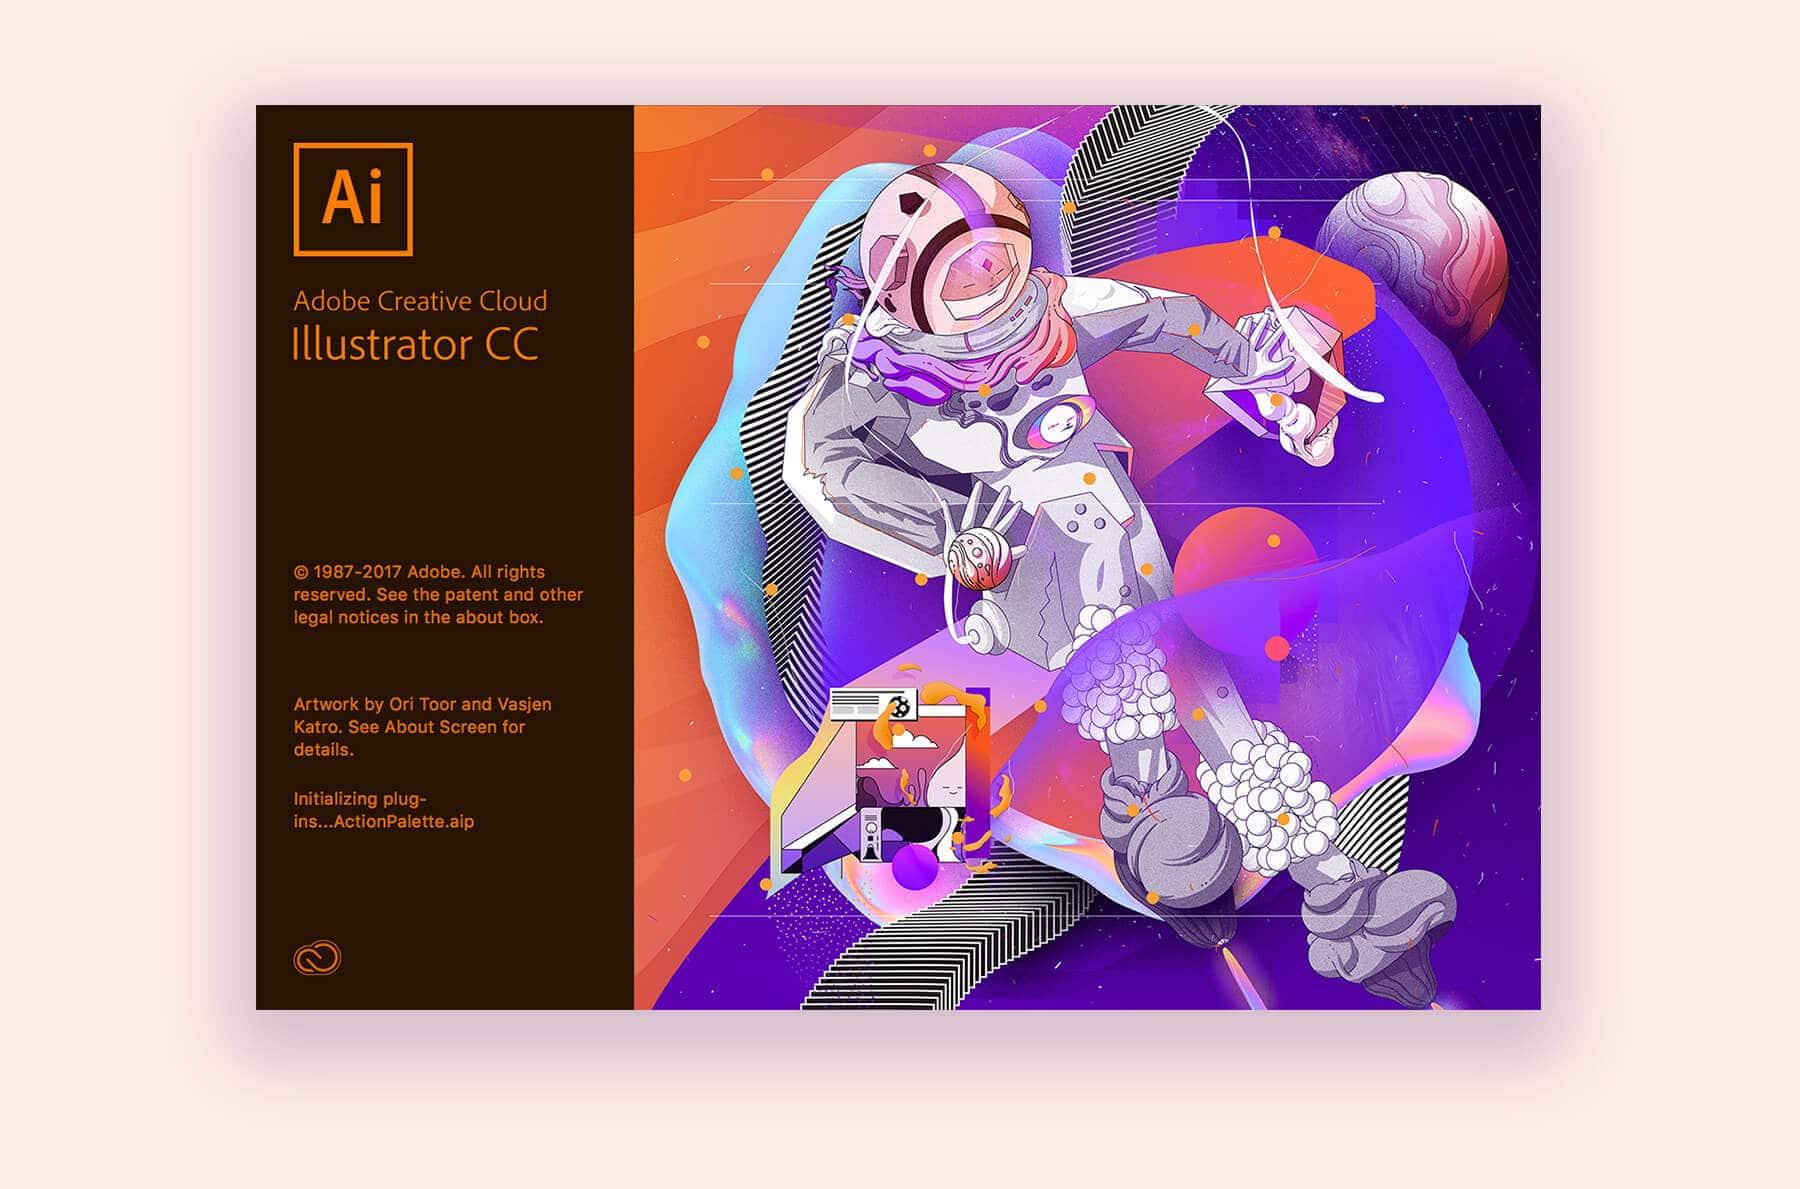 Adobe Illustrator CC 2020 24.2.3.521 Free Download - PC